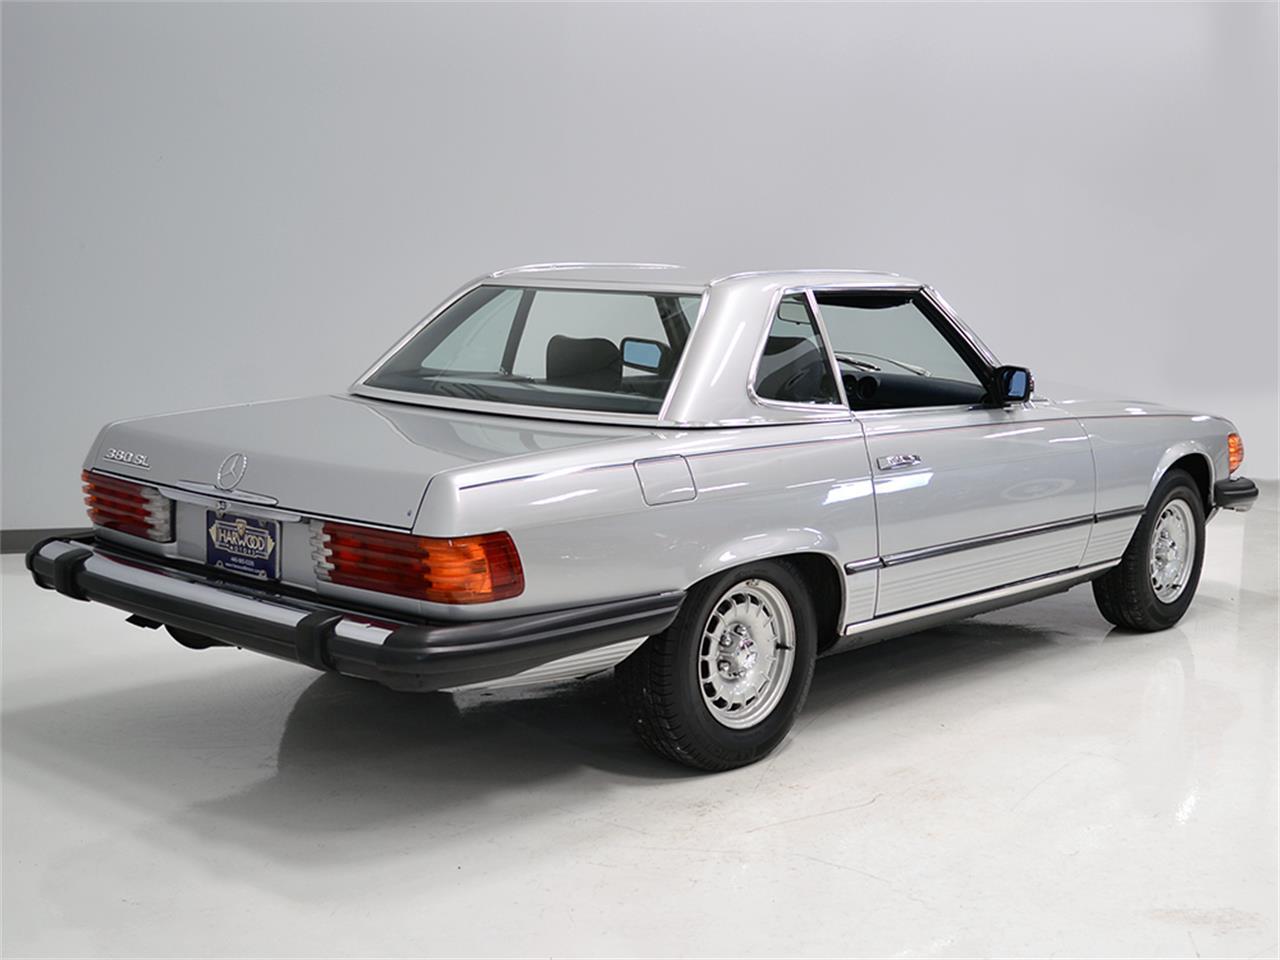 Large Picture of '84 Mercedes-Benz 380SL Offered by Harwood Motors, LTD. - KA2F